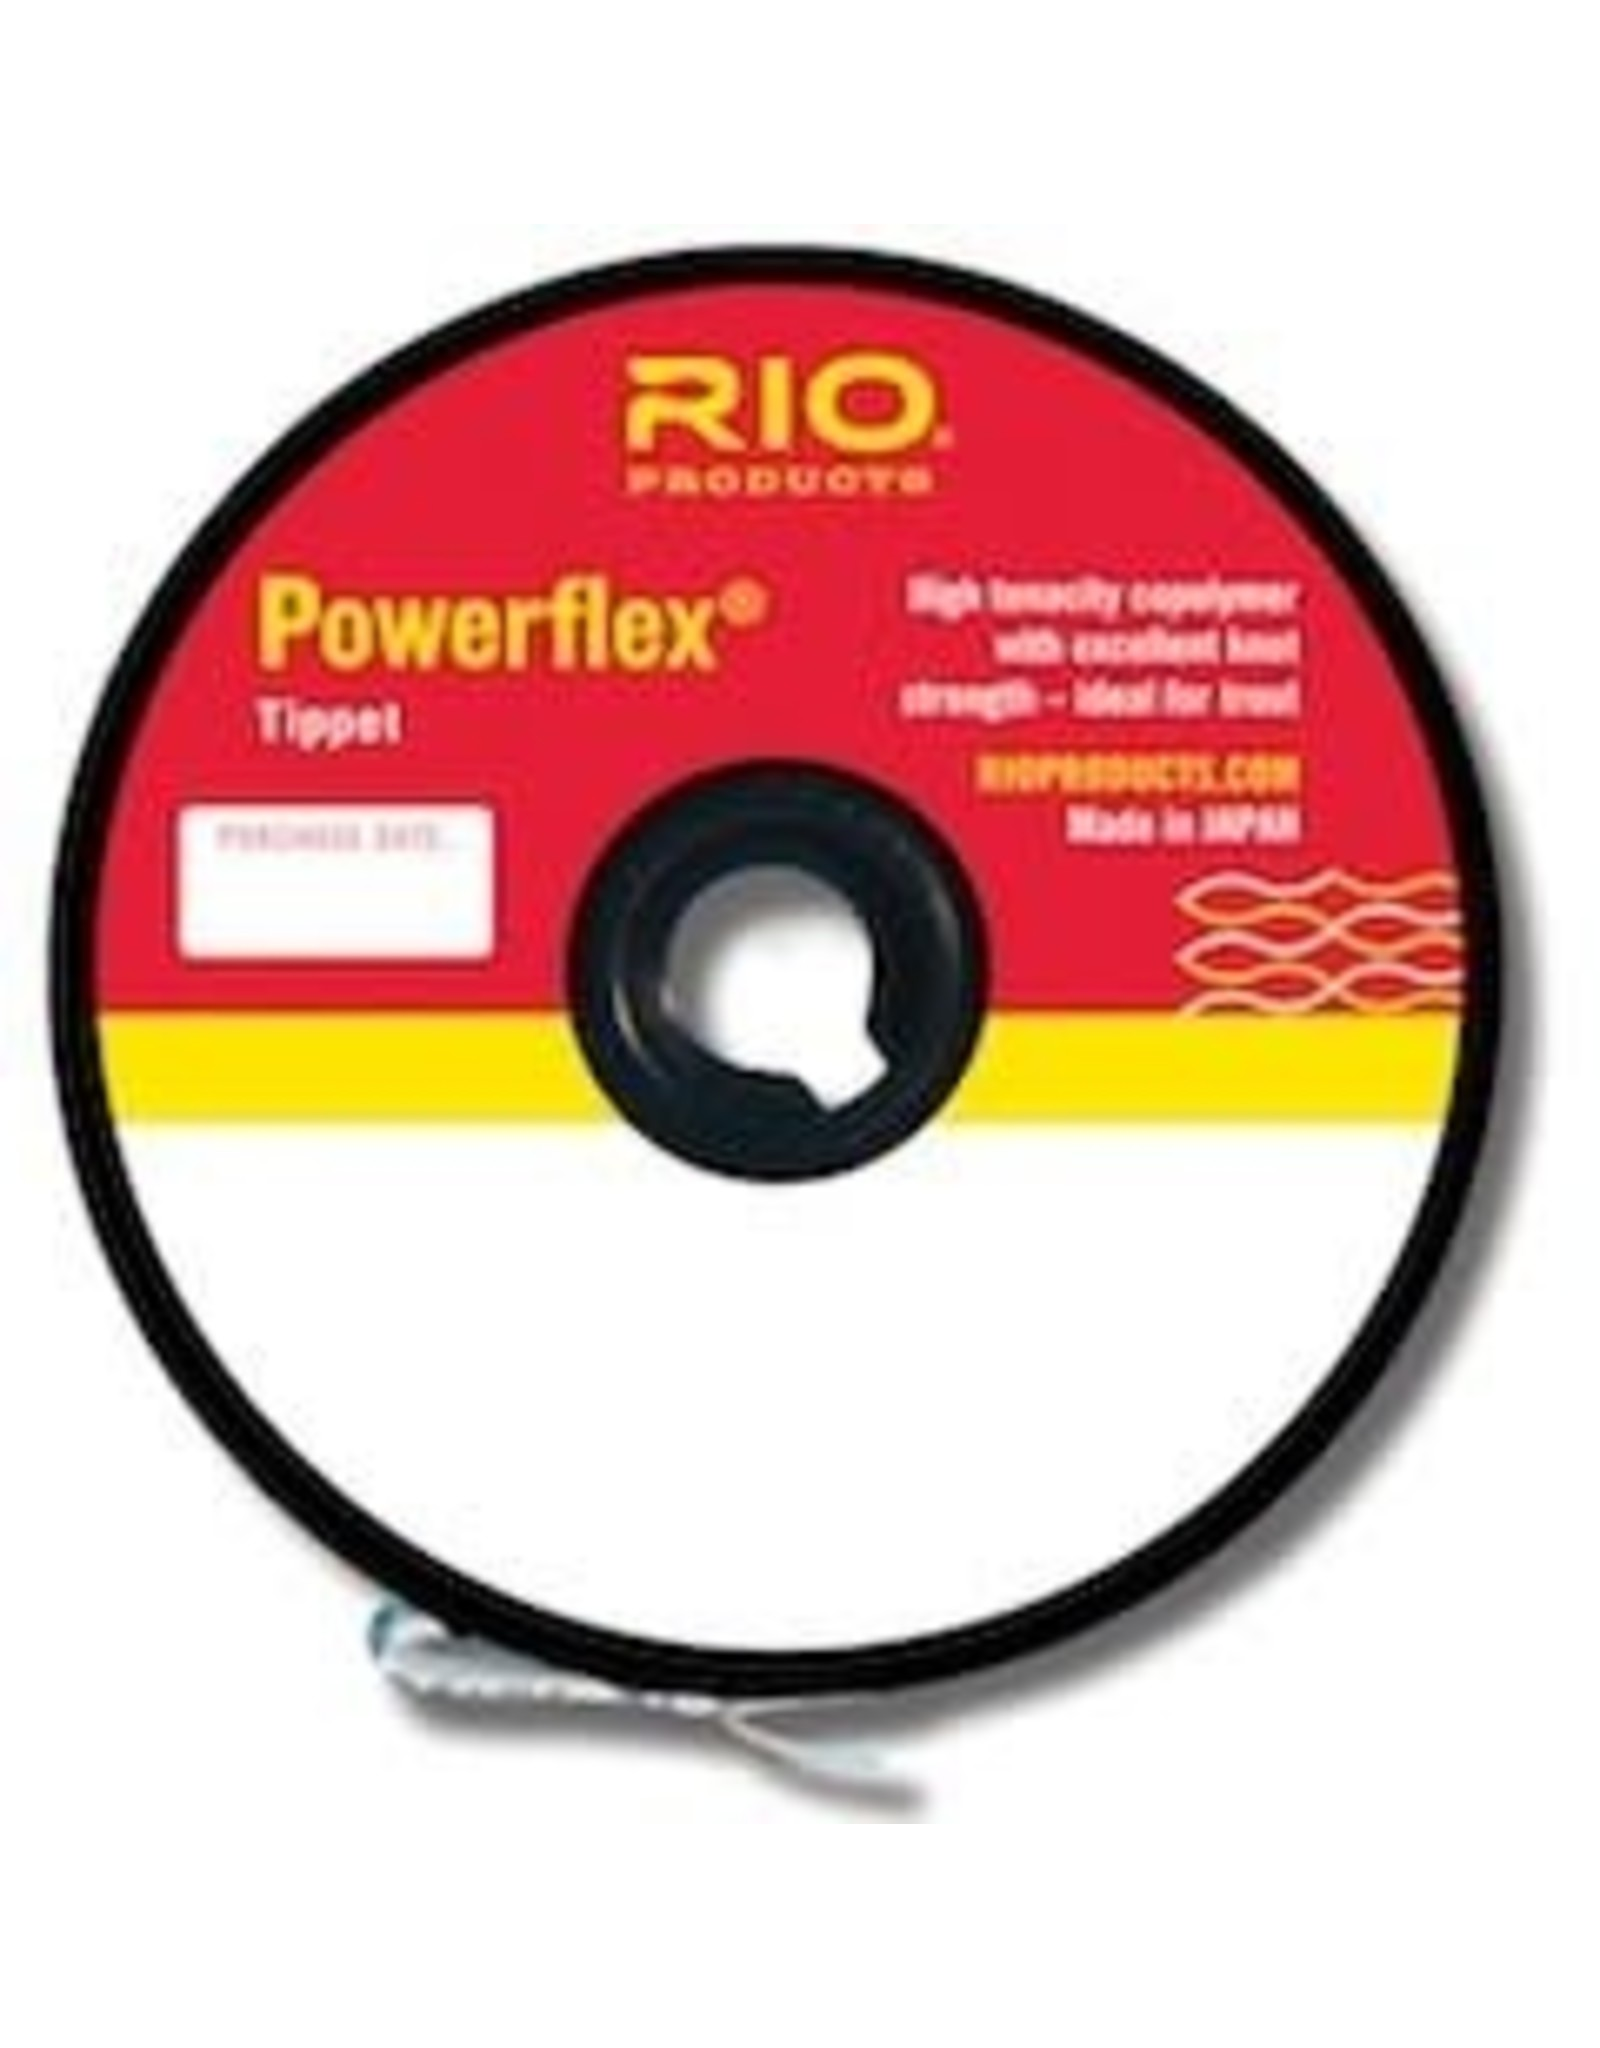 RIO RIO POWERFLEX TIPPET 30 YDS